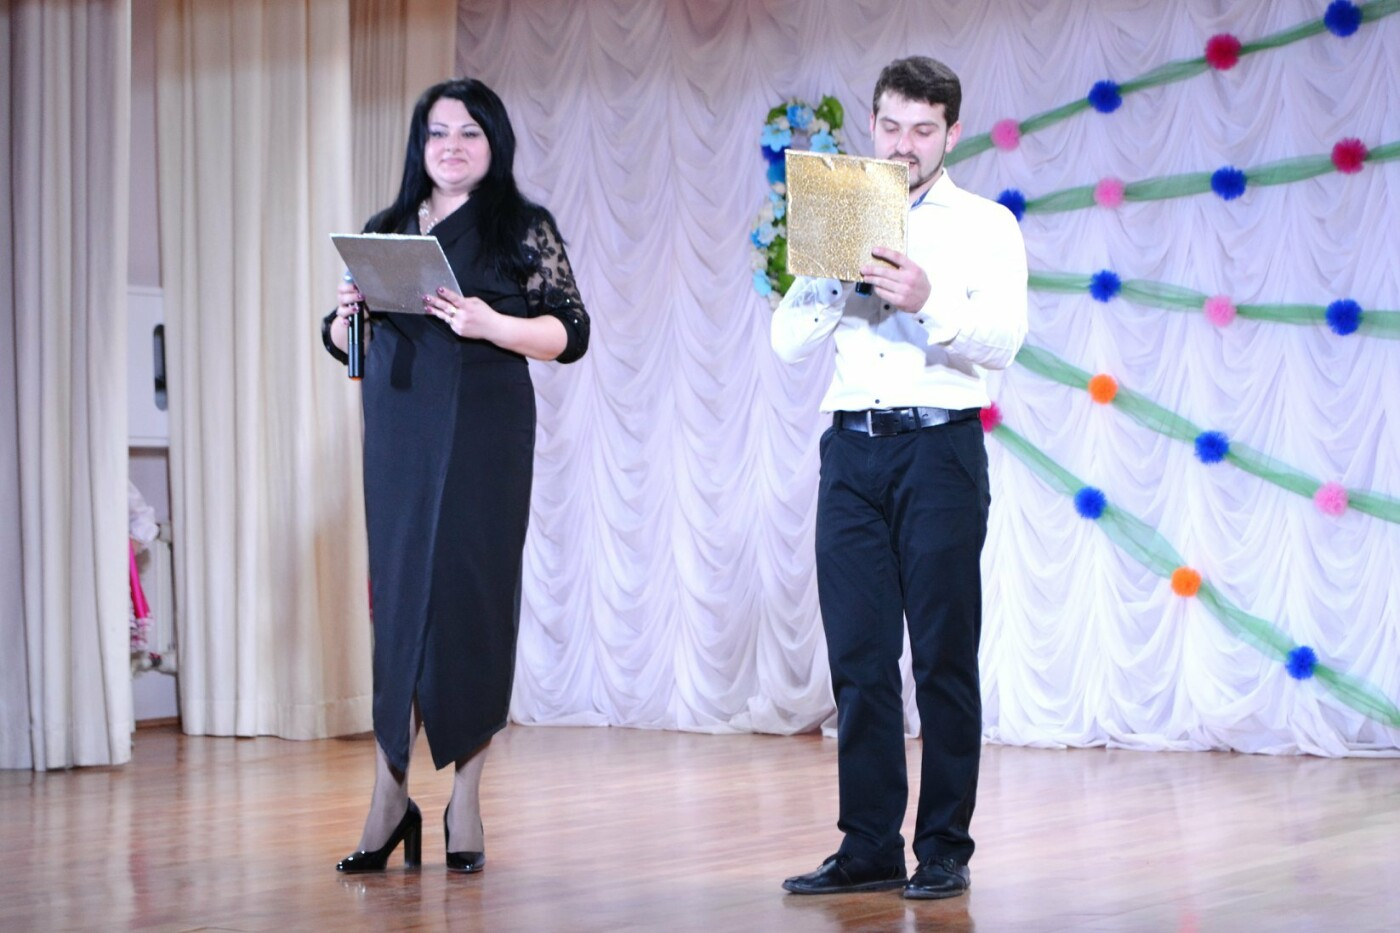 В селе Малодолинское поздравили женщин с 8 Марта, фото-9